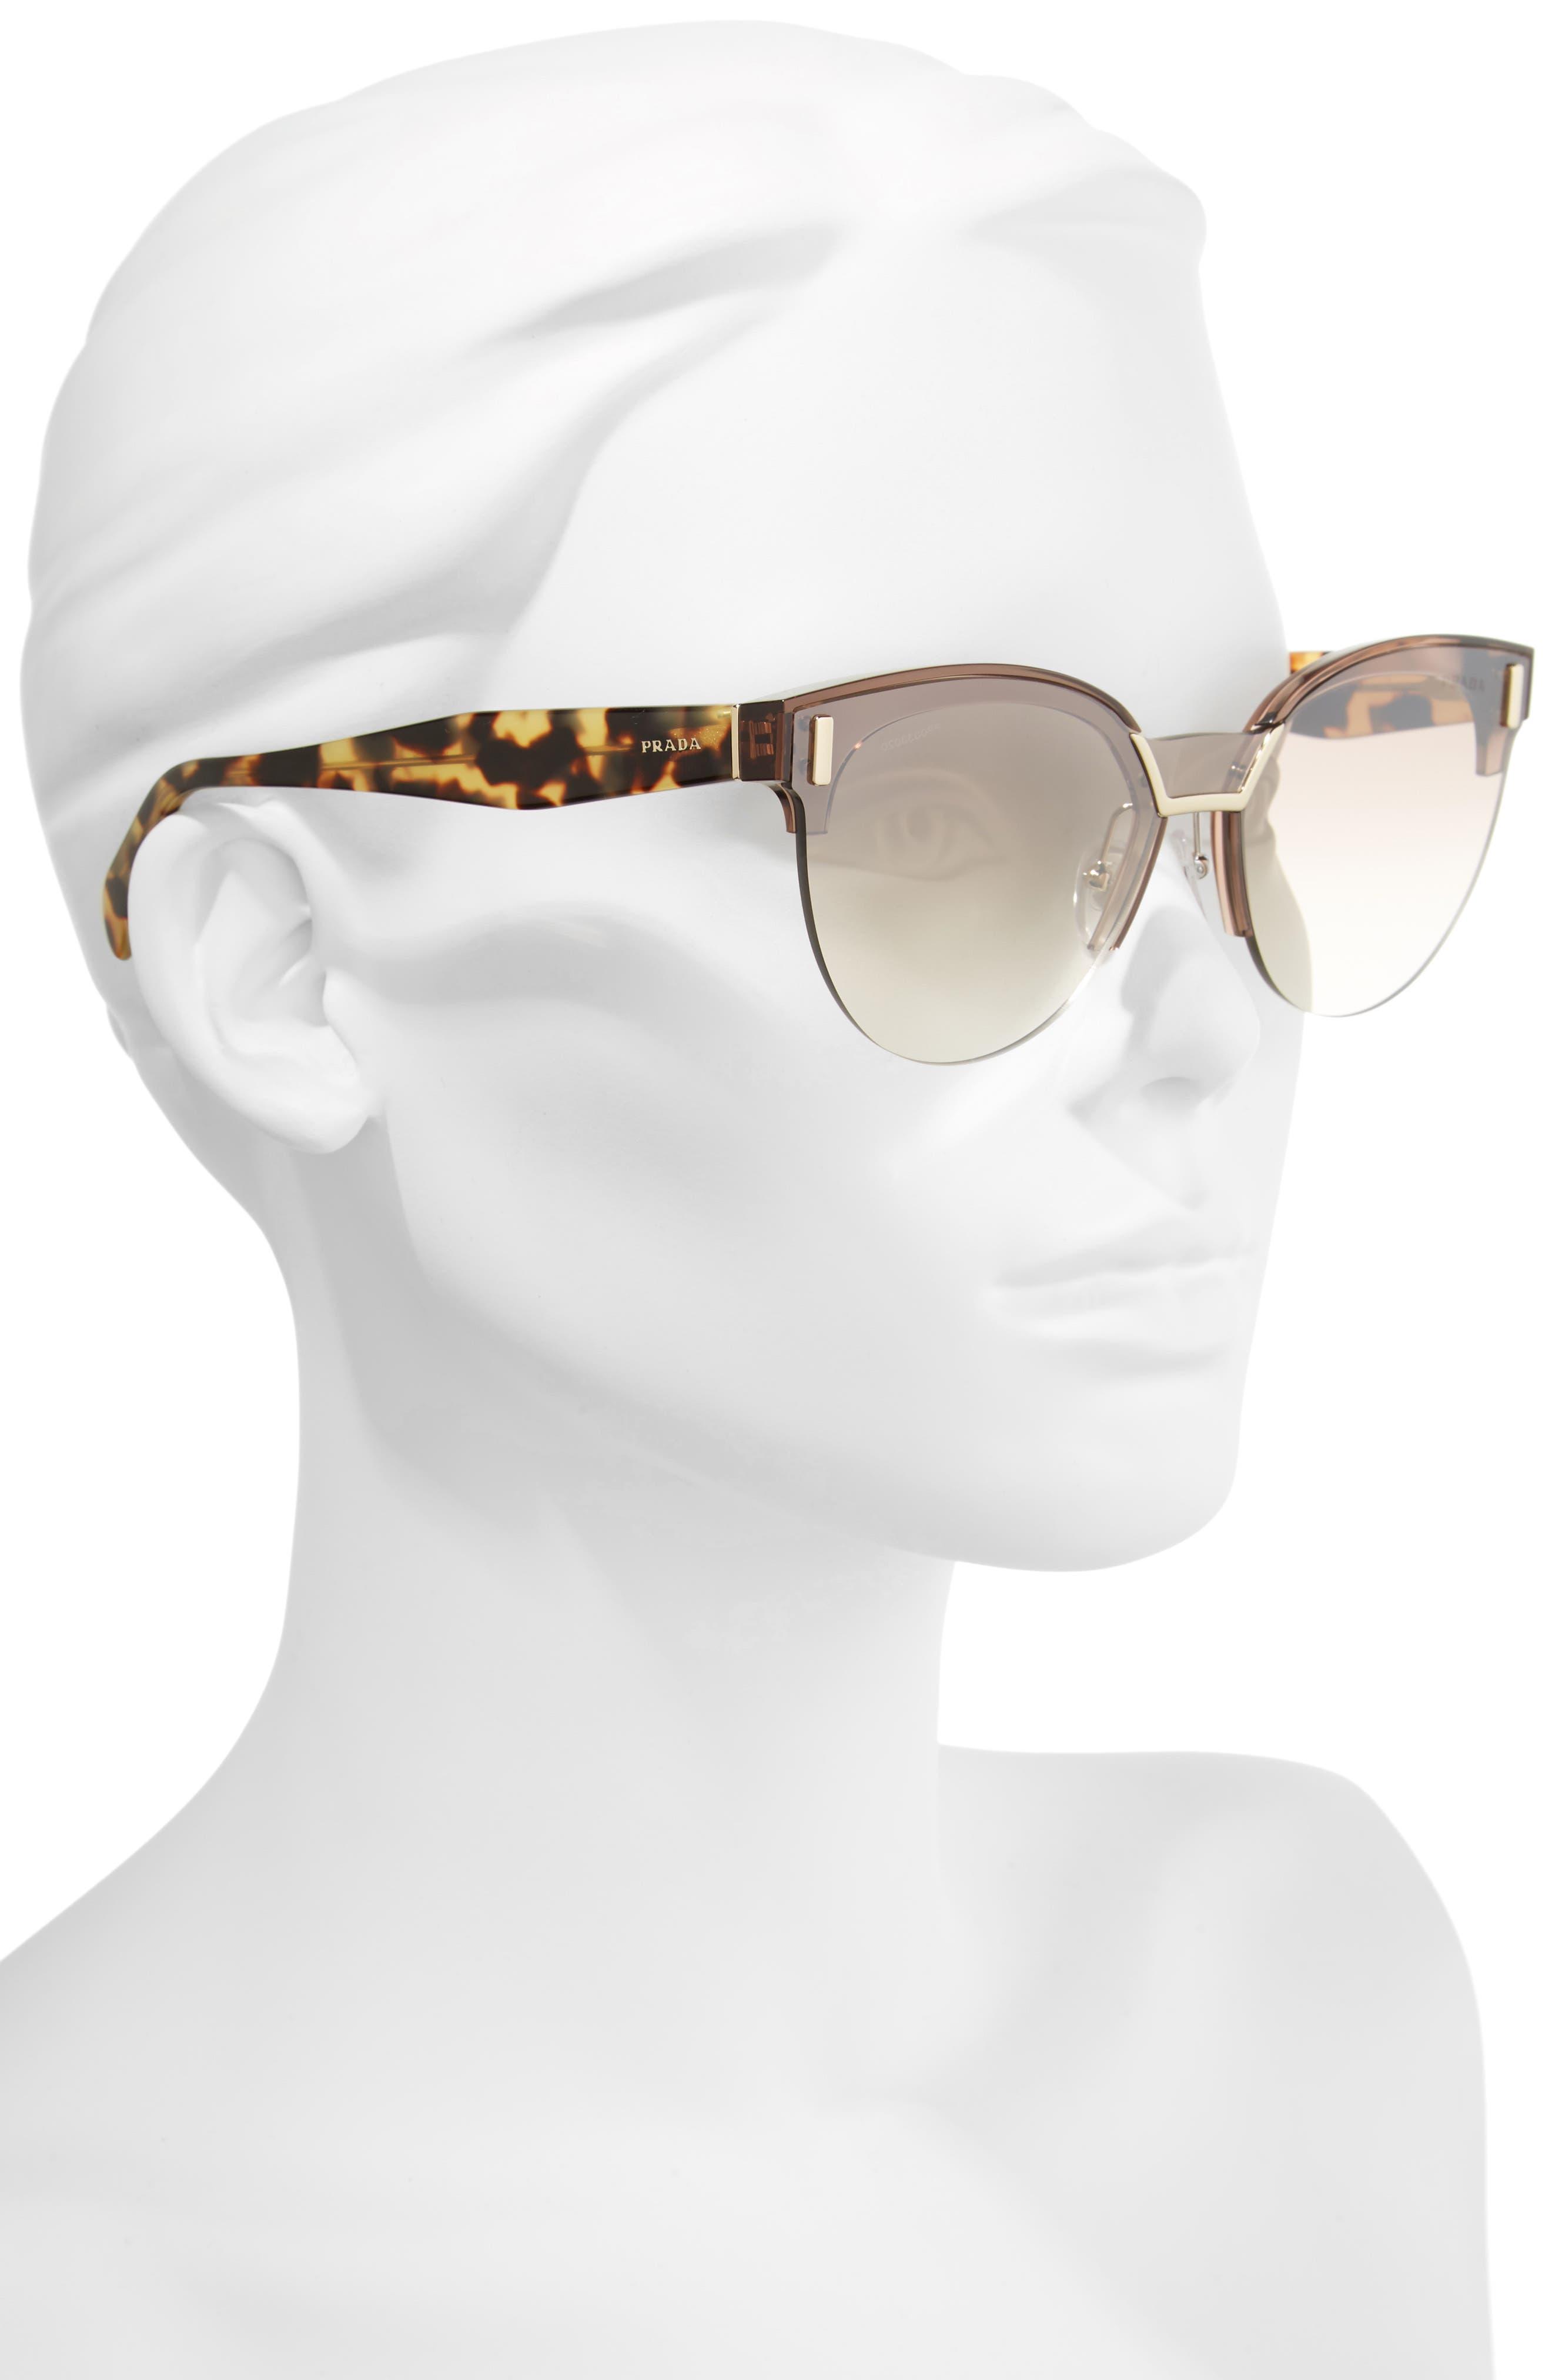 43mm Semi Rimless Sunglasses,                             Alternate thumbnail 3, color,                             TRANSPARENT BROWN